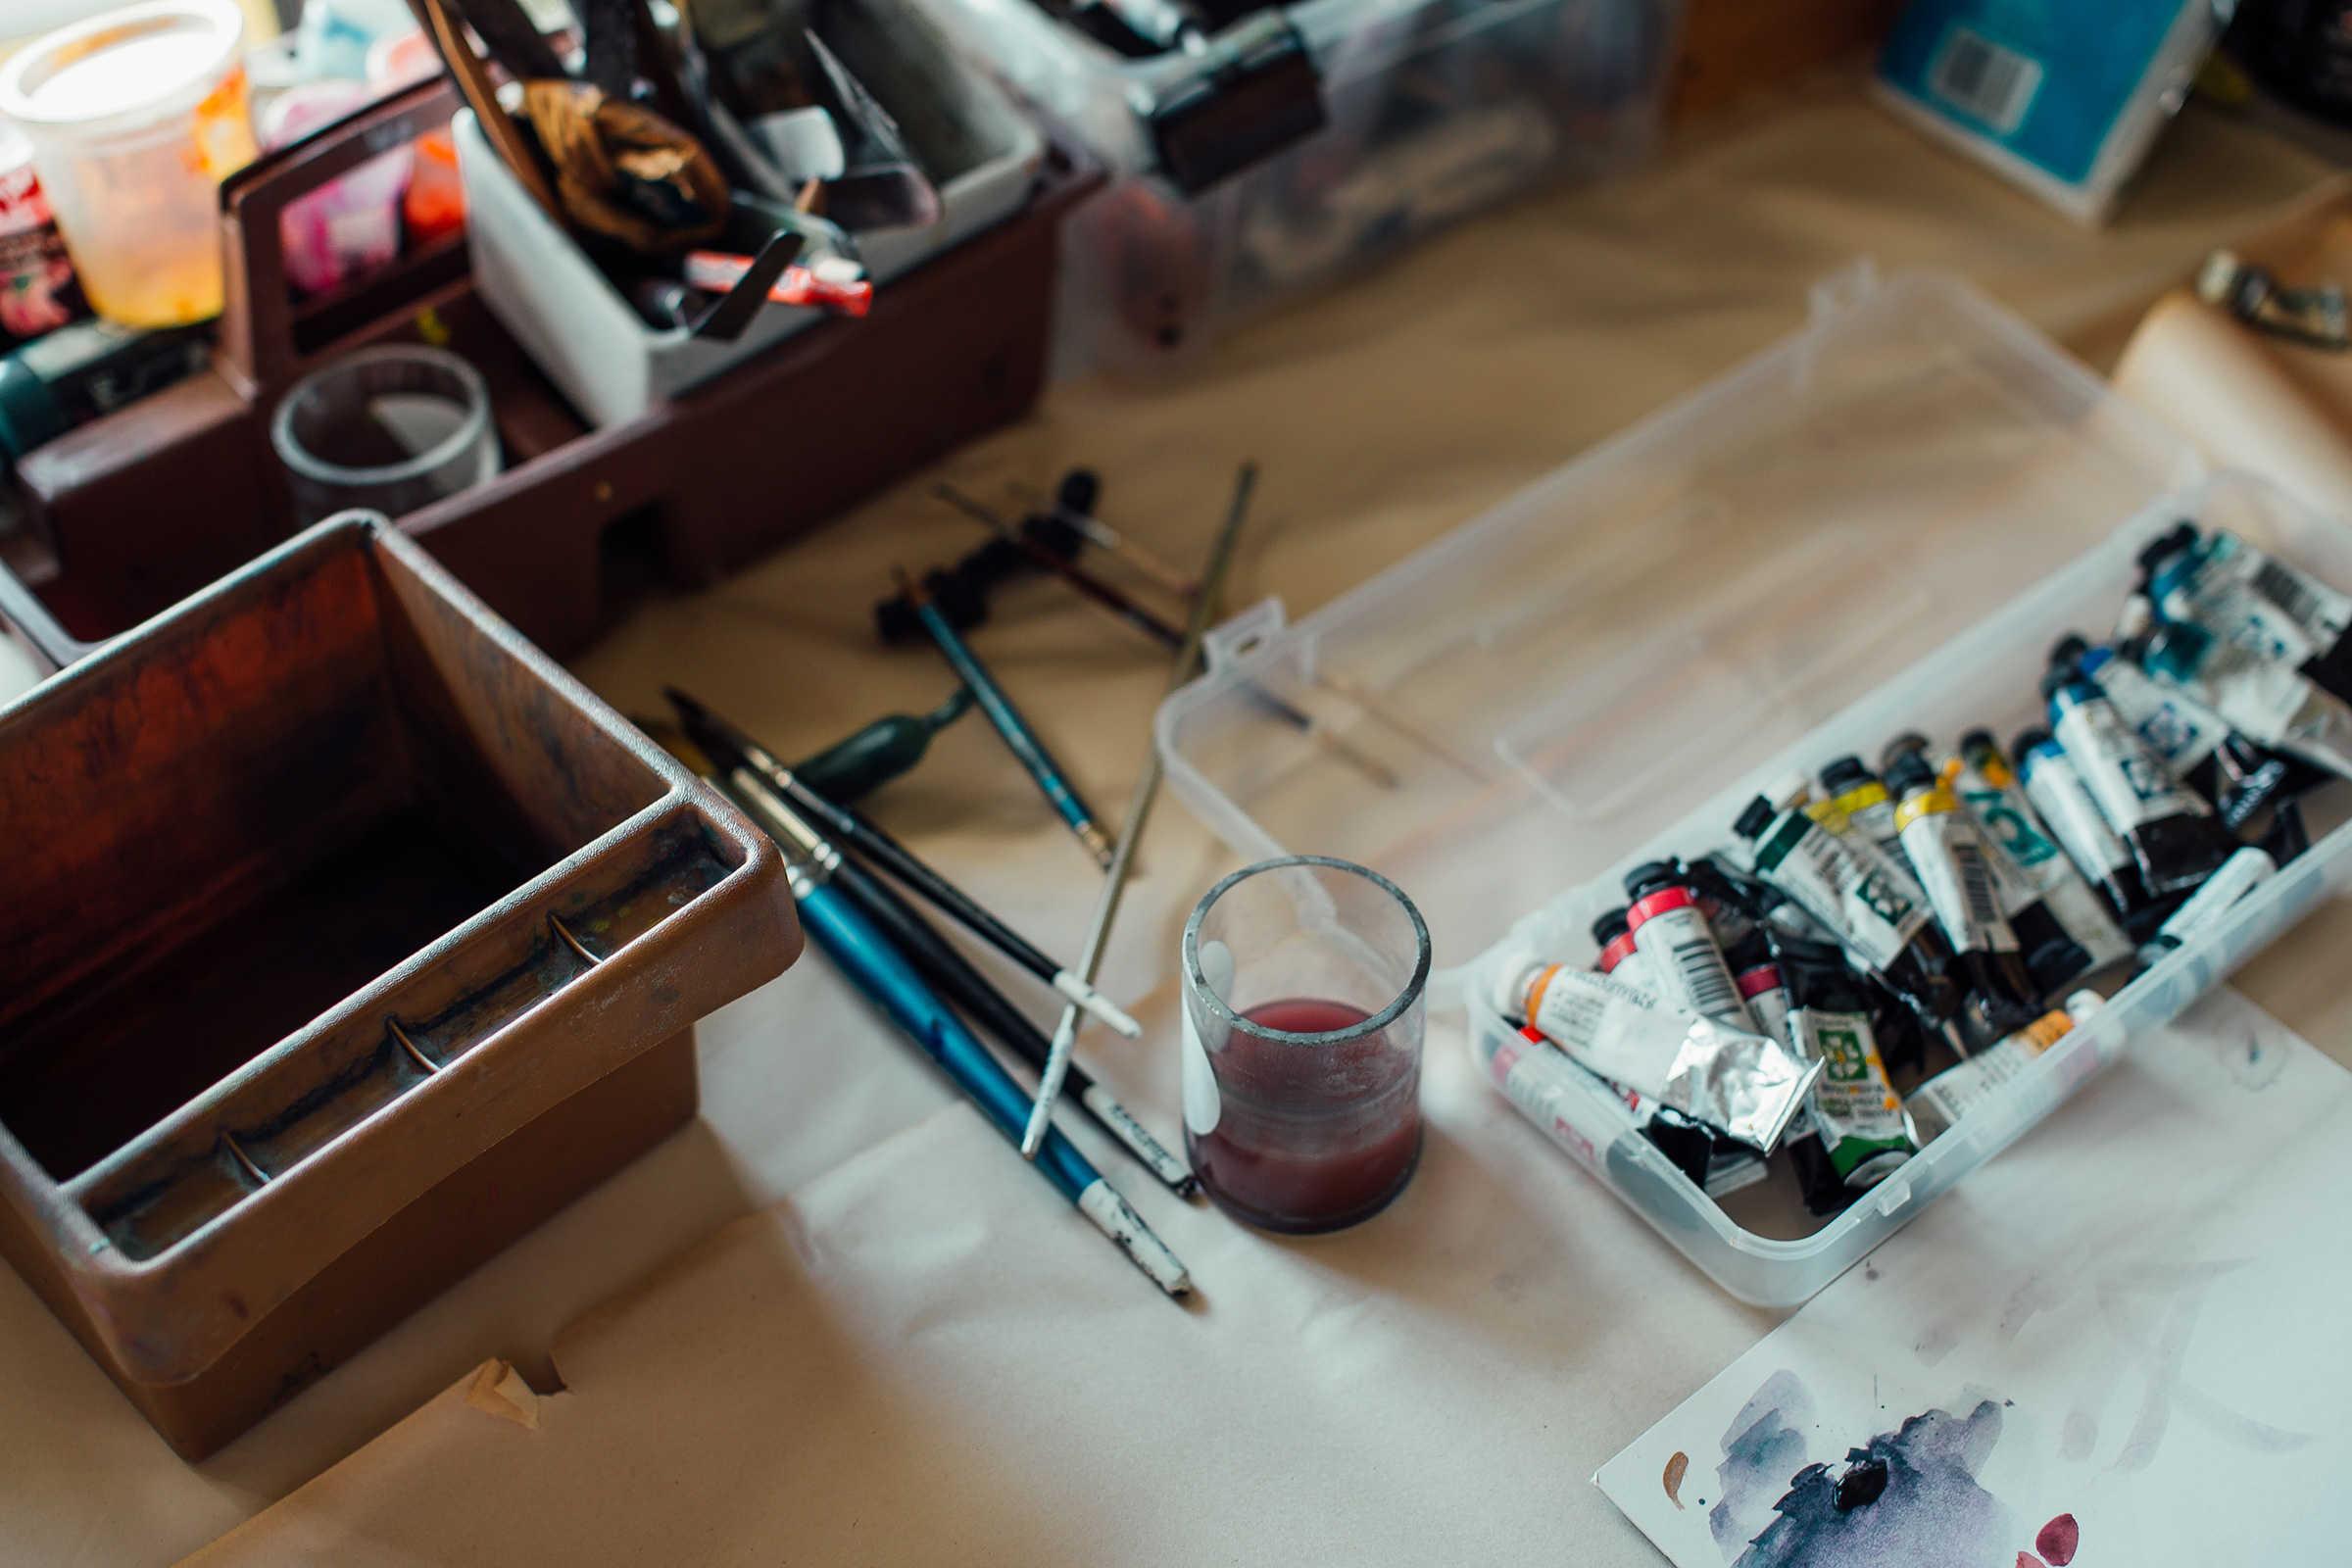 Preparing for Art Creation